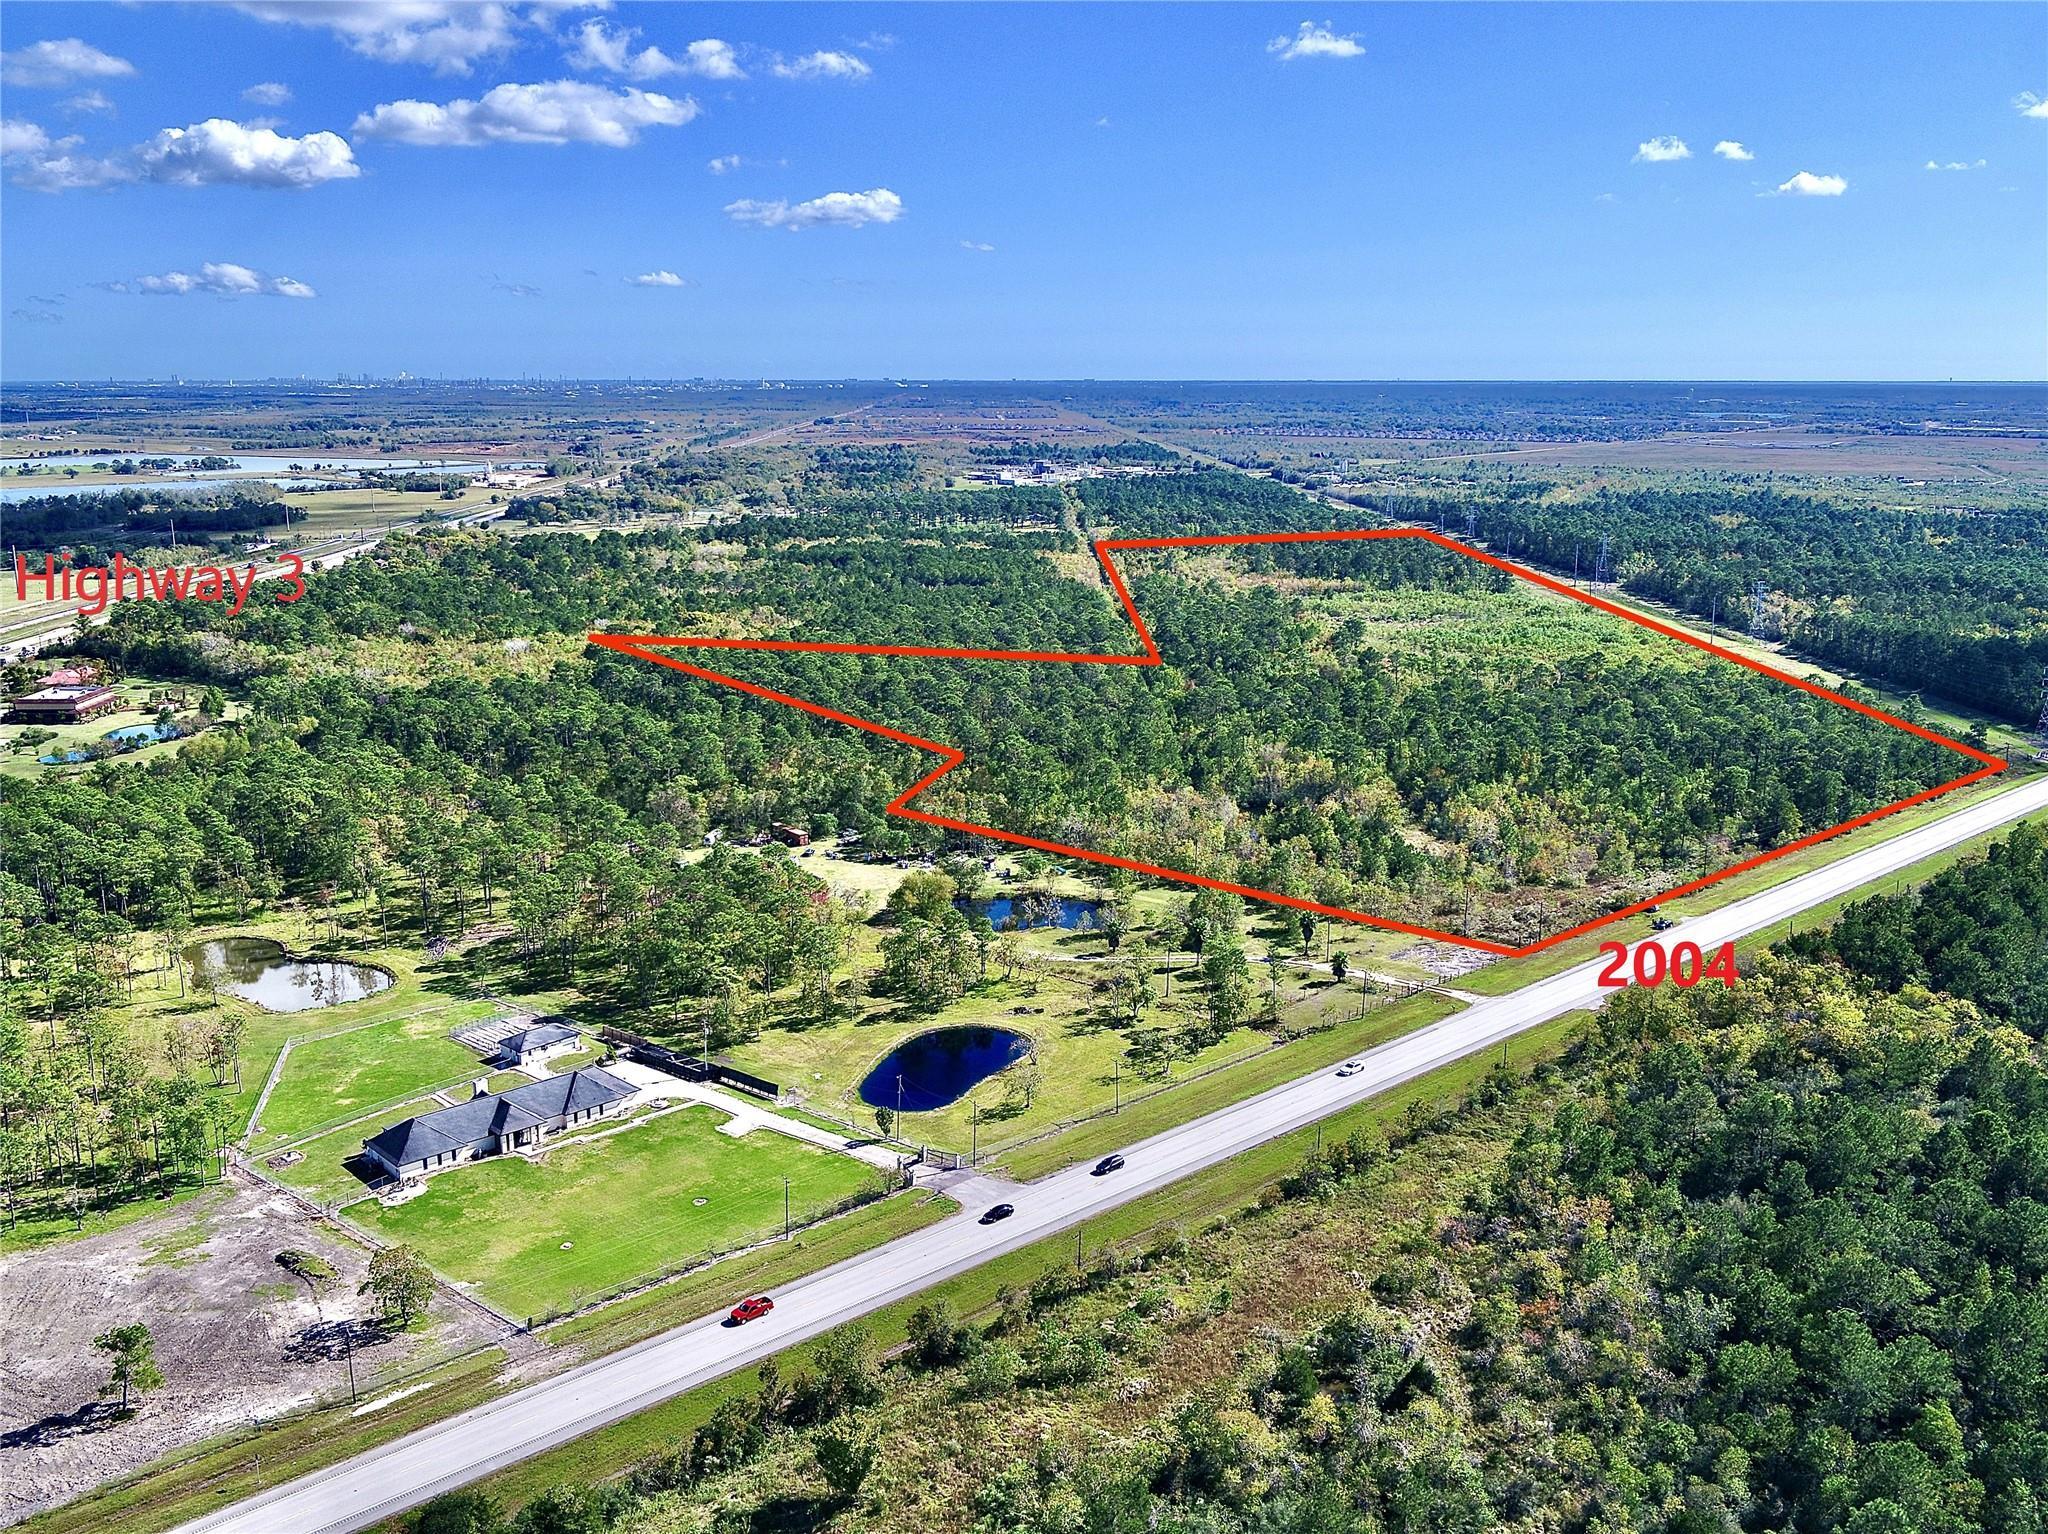 000 Fm 2004 Expressway Property Photo